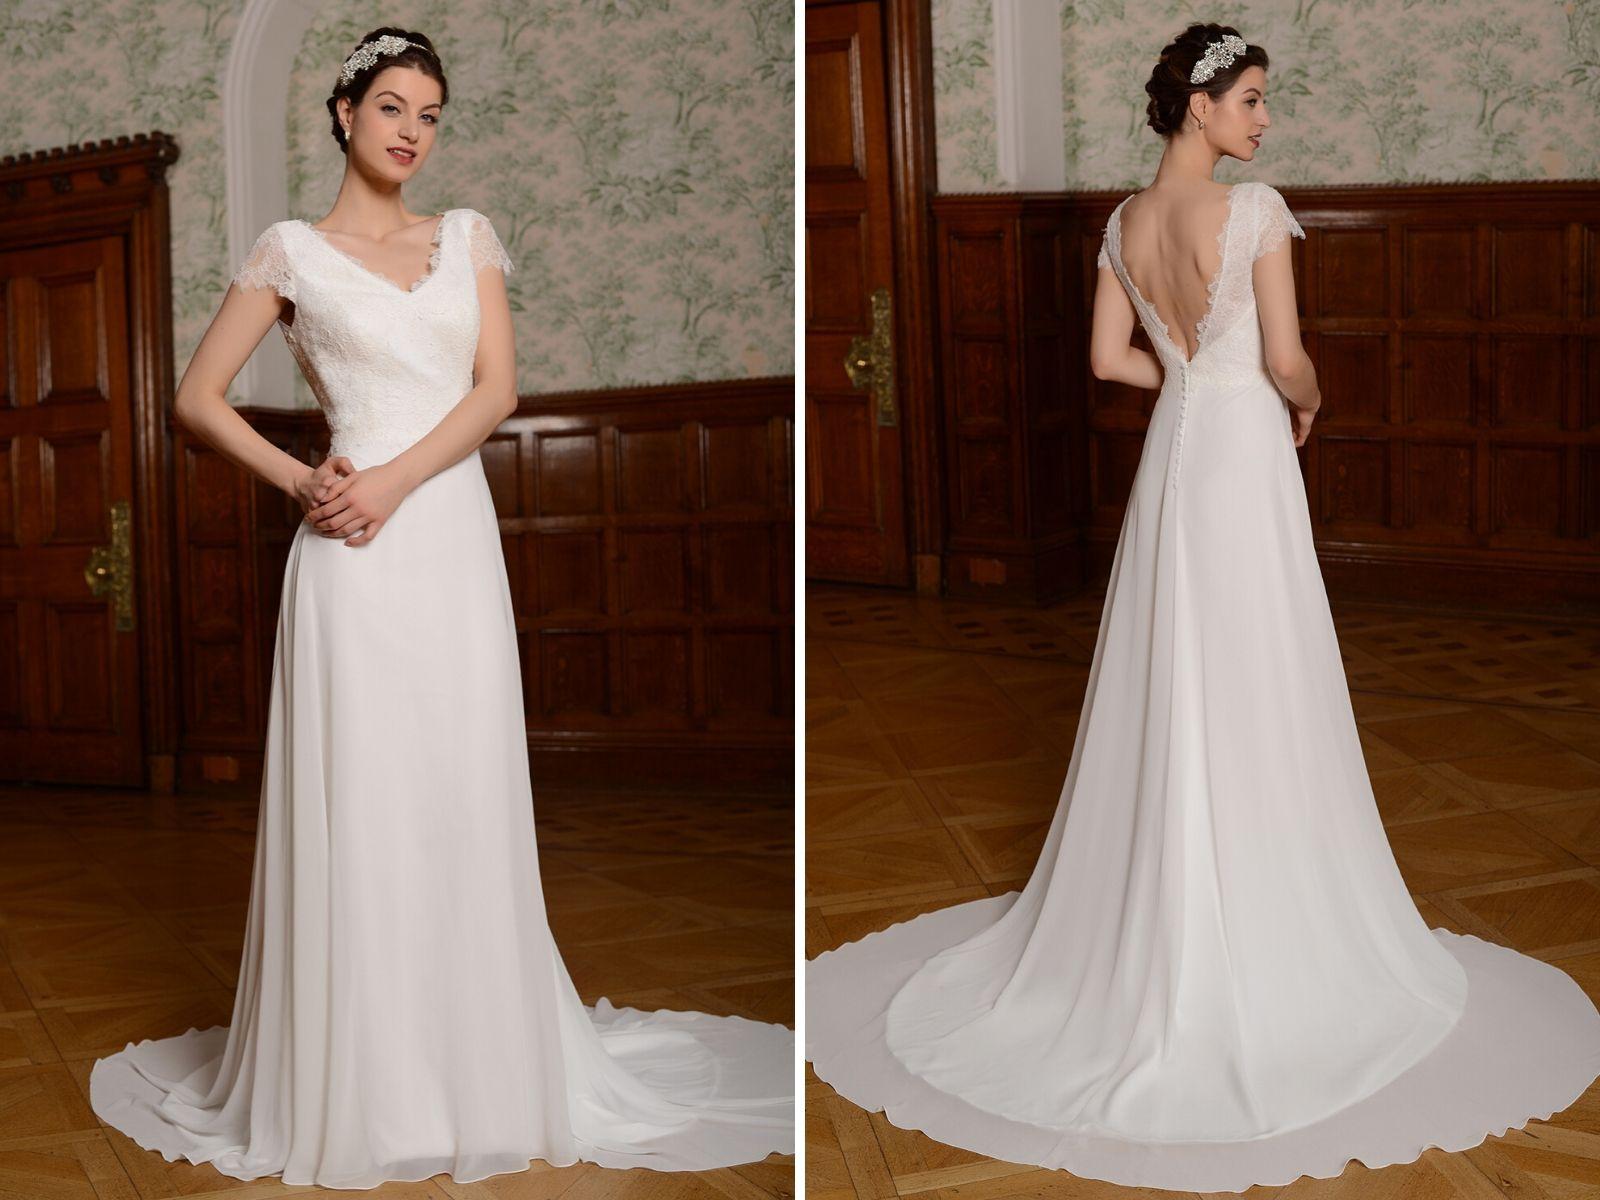 Mylene by Millie May boho wedding dress for the statement bride